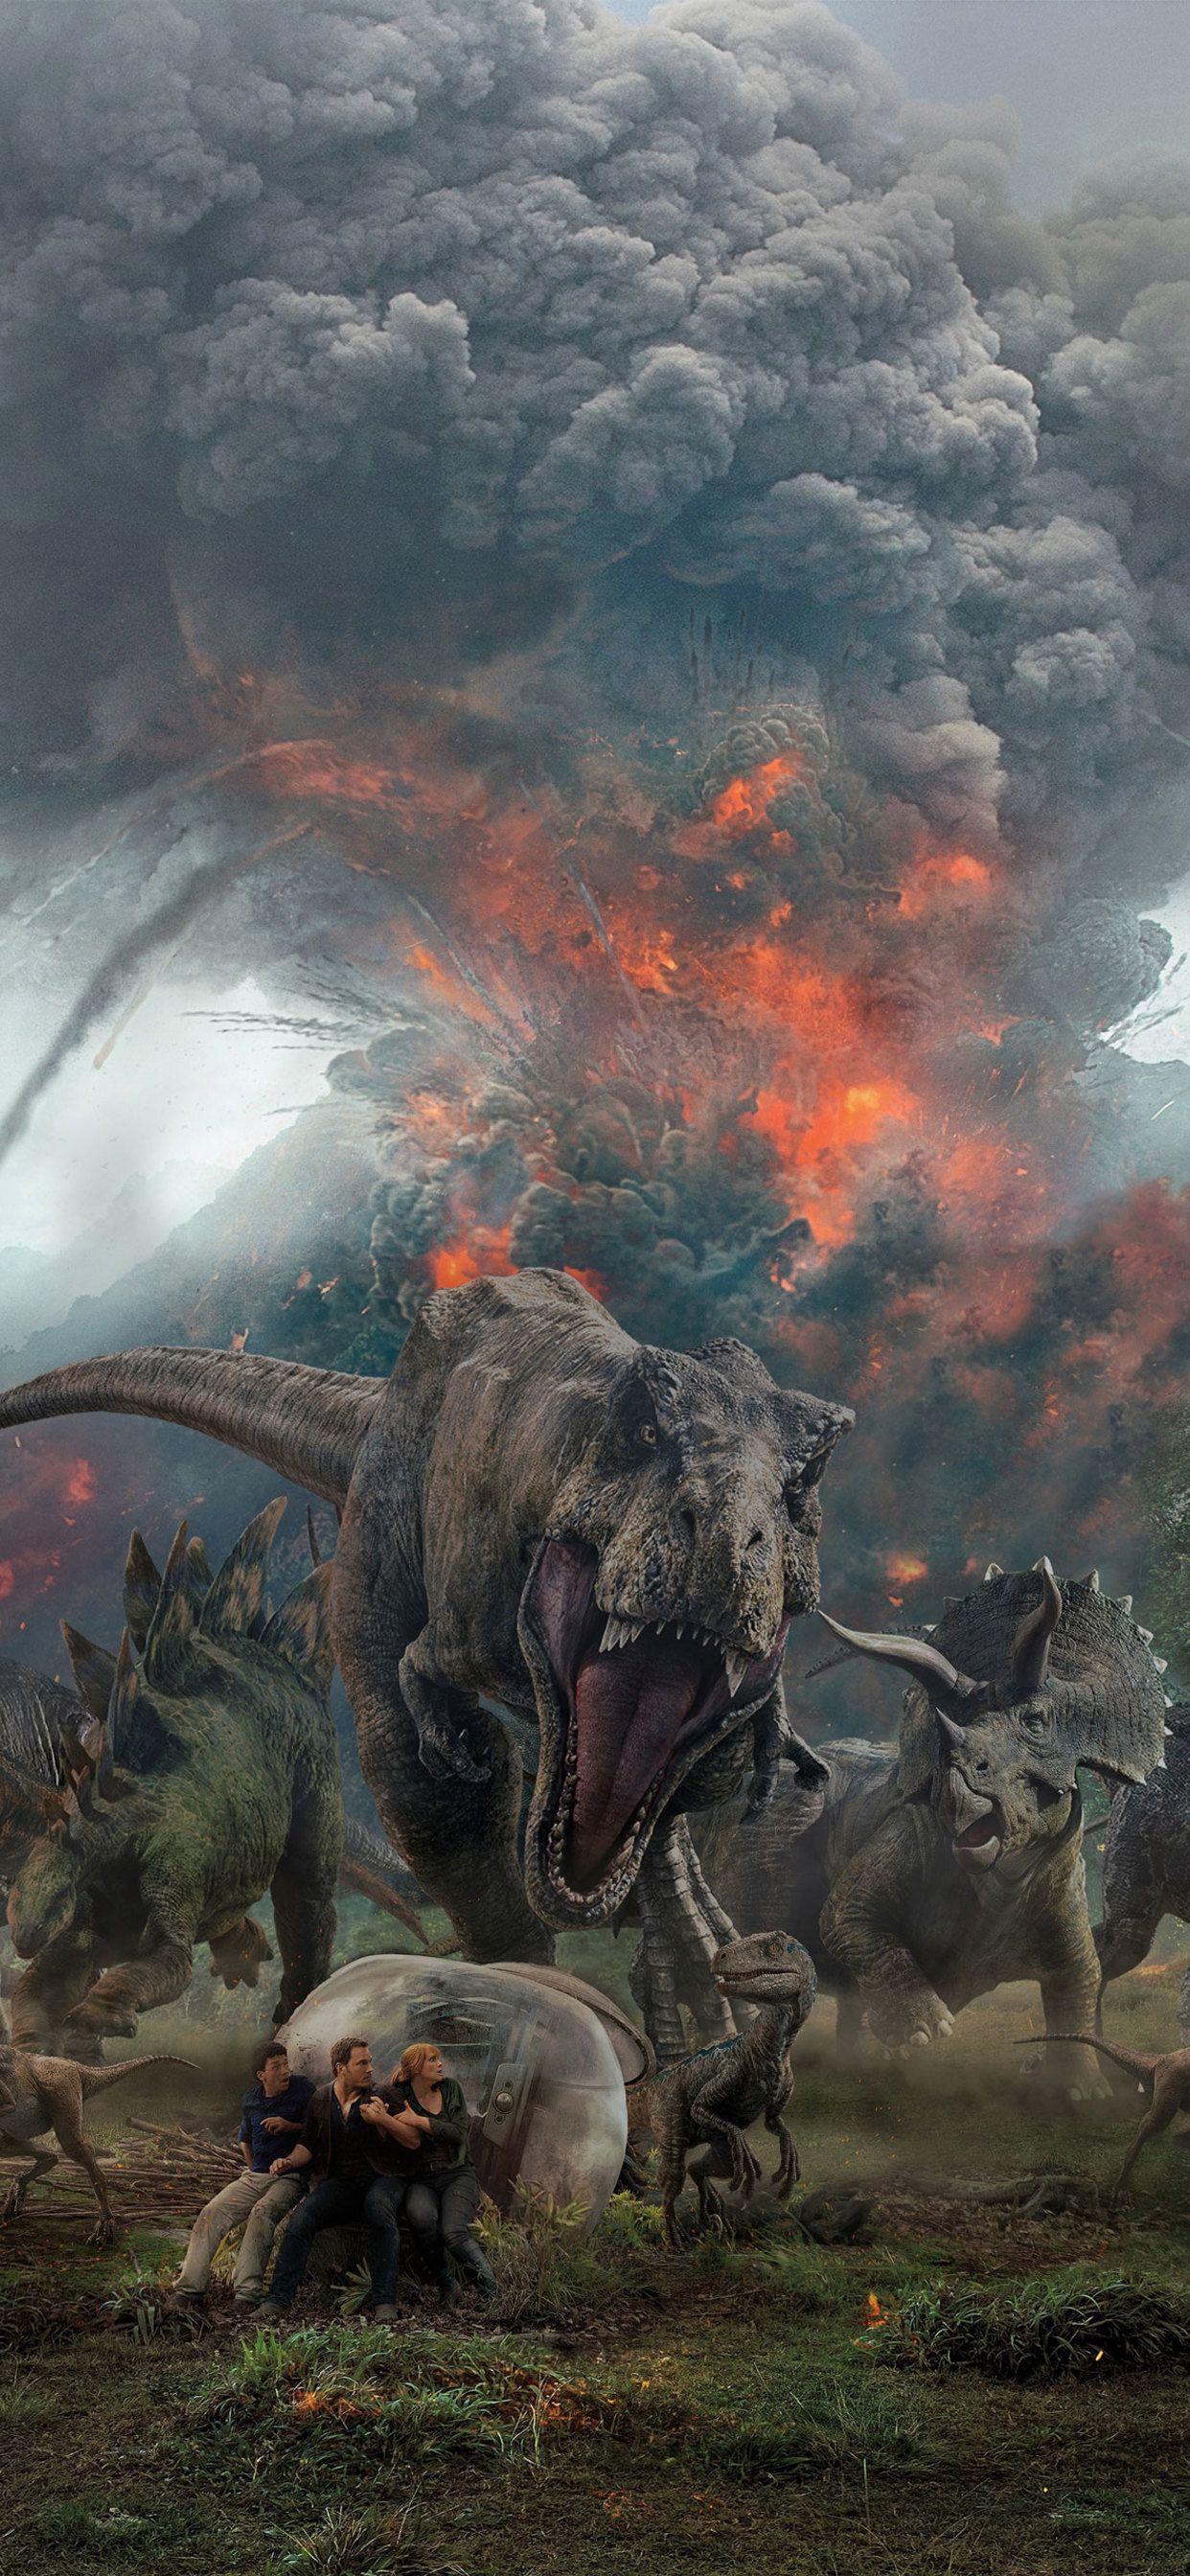 Pin by ESLAM HISN on Wallpaper Jurassic world wallpaper